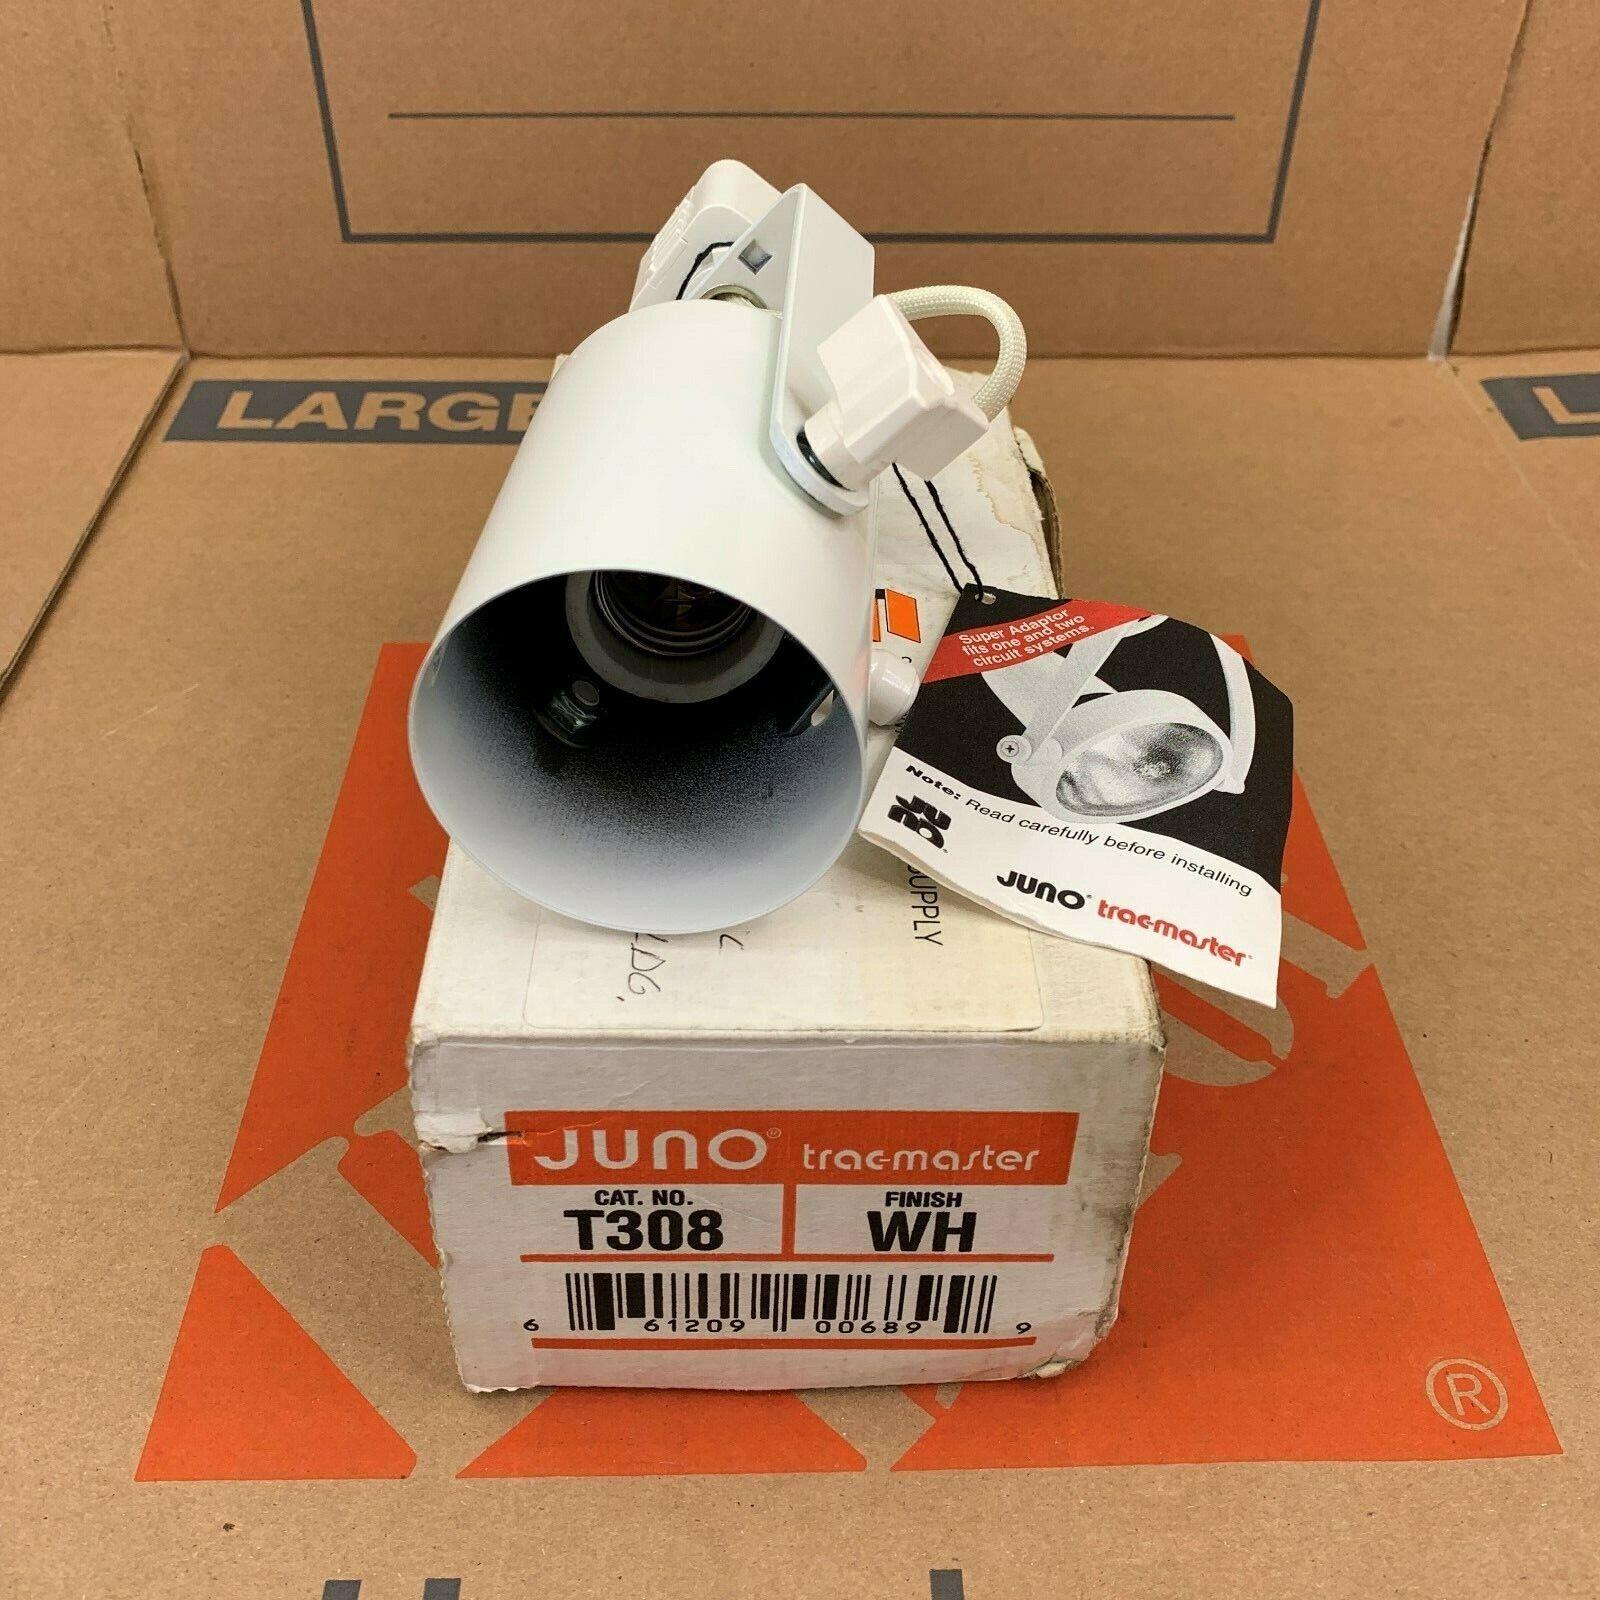 JUNO TRAC-MASTER TRACK LIGHT FIXTURE T308 WH PAR 38 WHITE  - $20.95